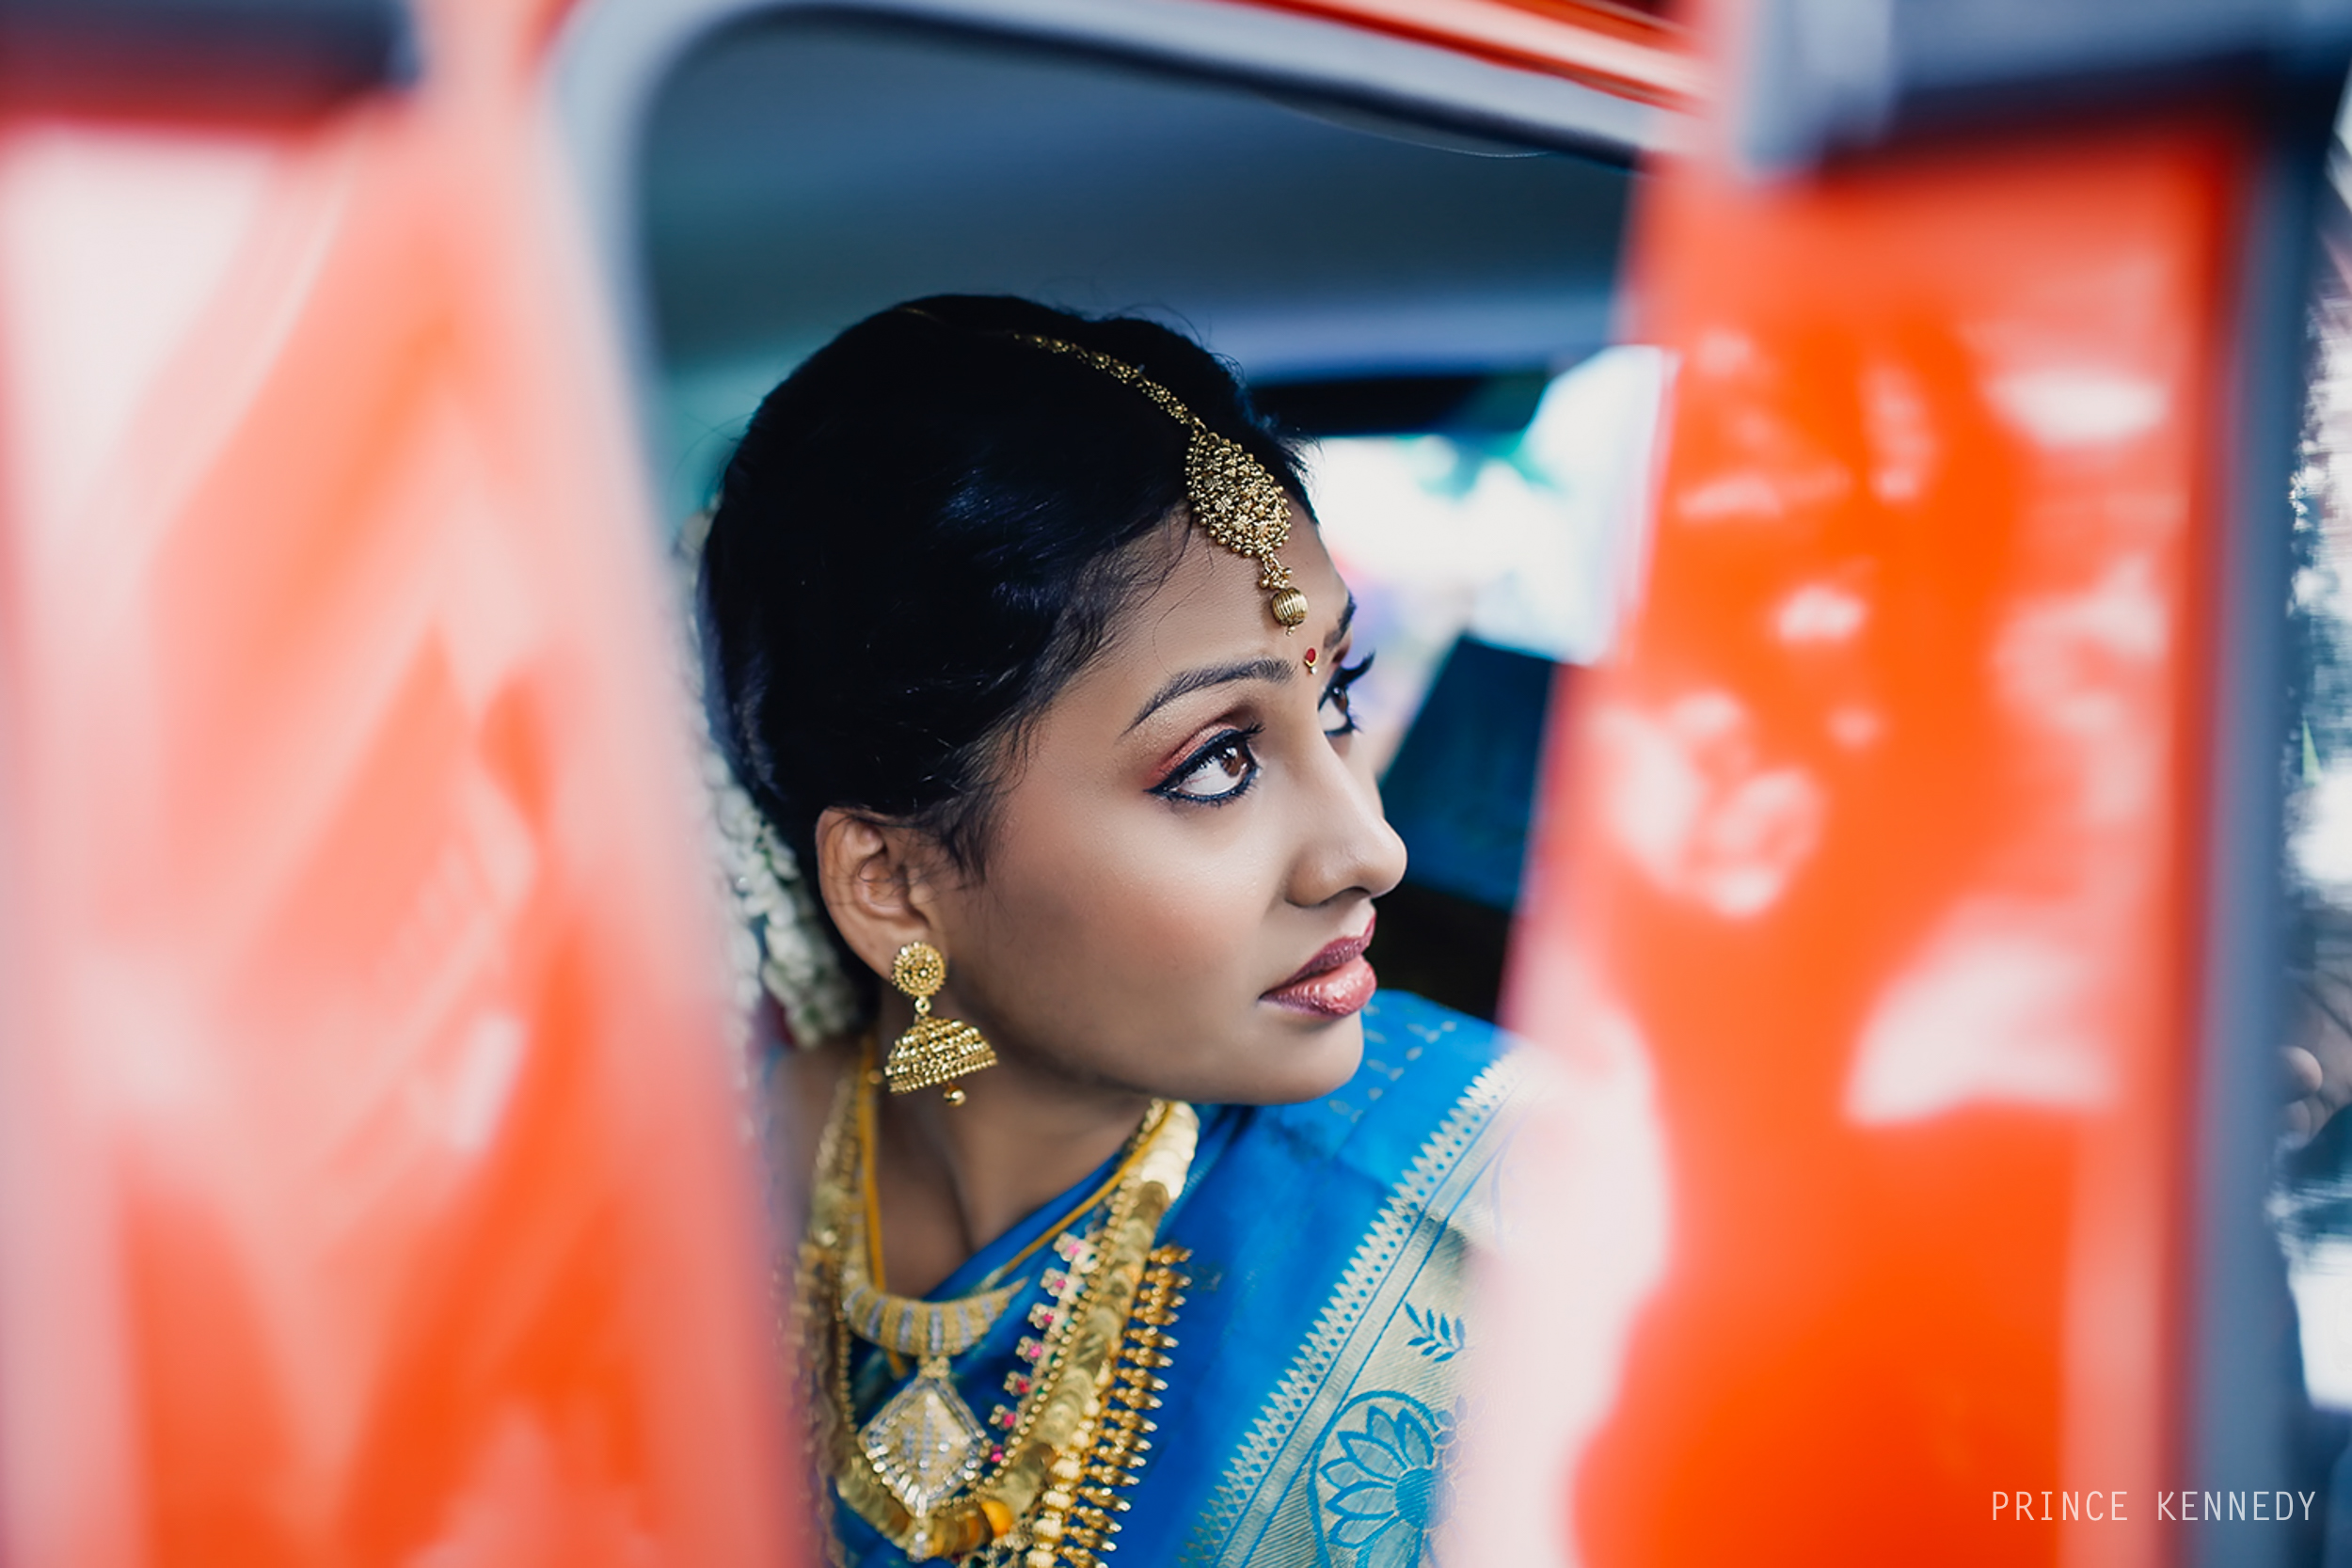 Wedding-weddings-candid-photography-chennai-photographer-best-photography1.jpg